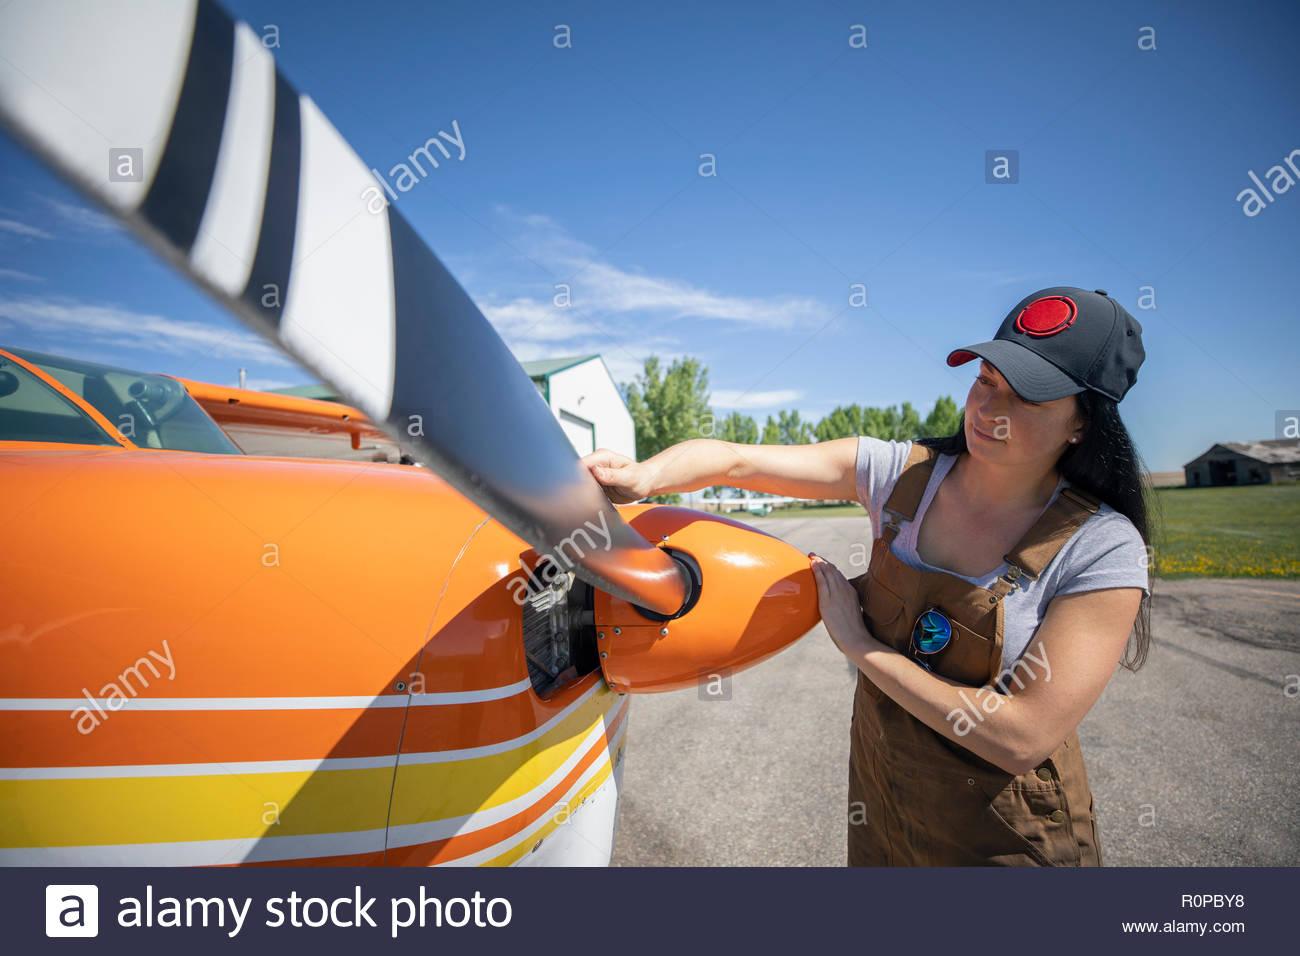 Ingenieurin Kontrolle propellor auf Flugmodus Stockbild